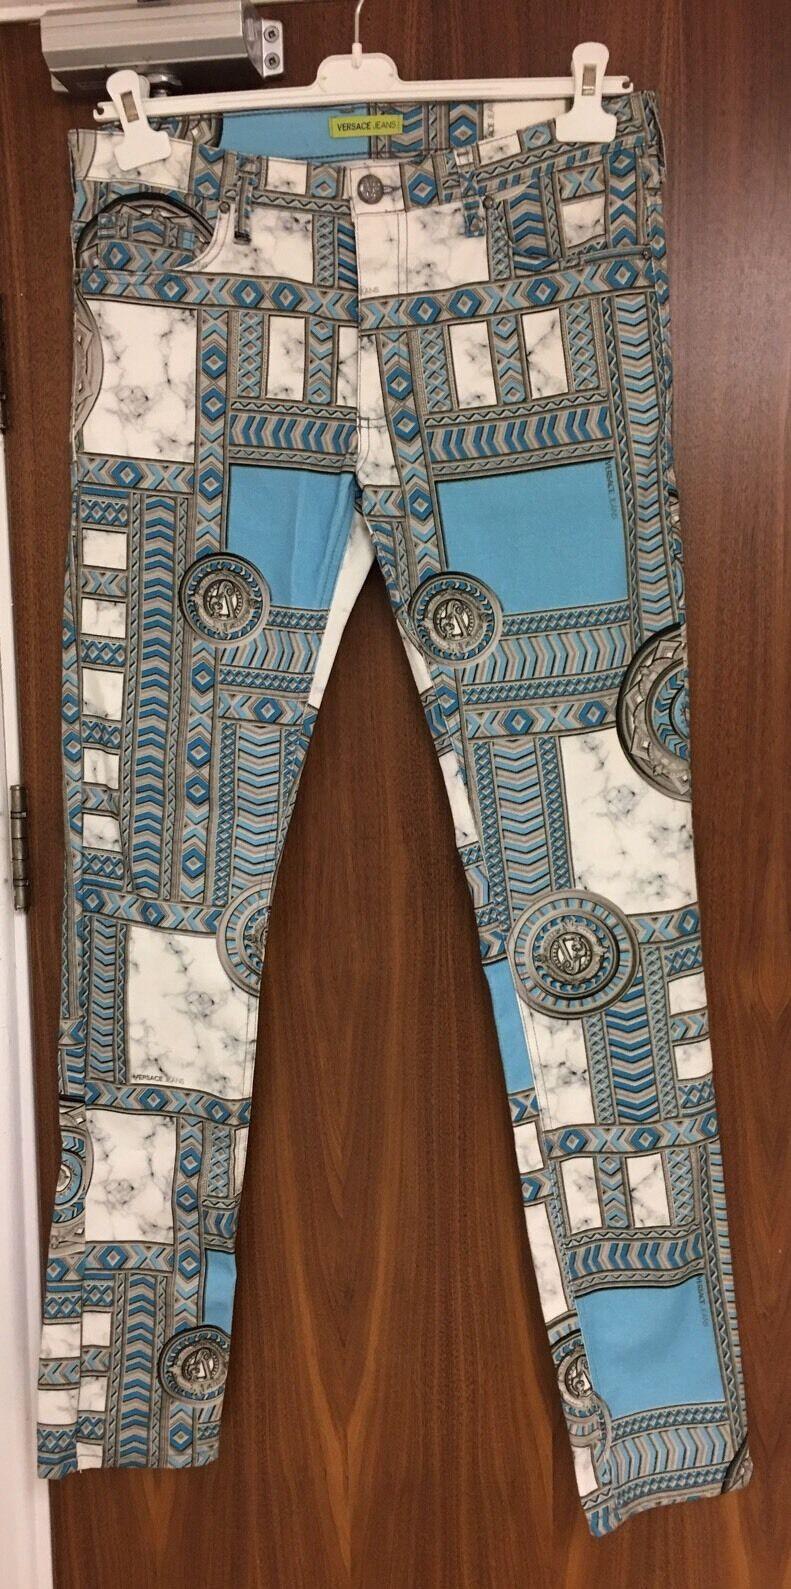 Versace Jeans grau & Blau Baroque Print Trousers W34